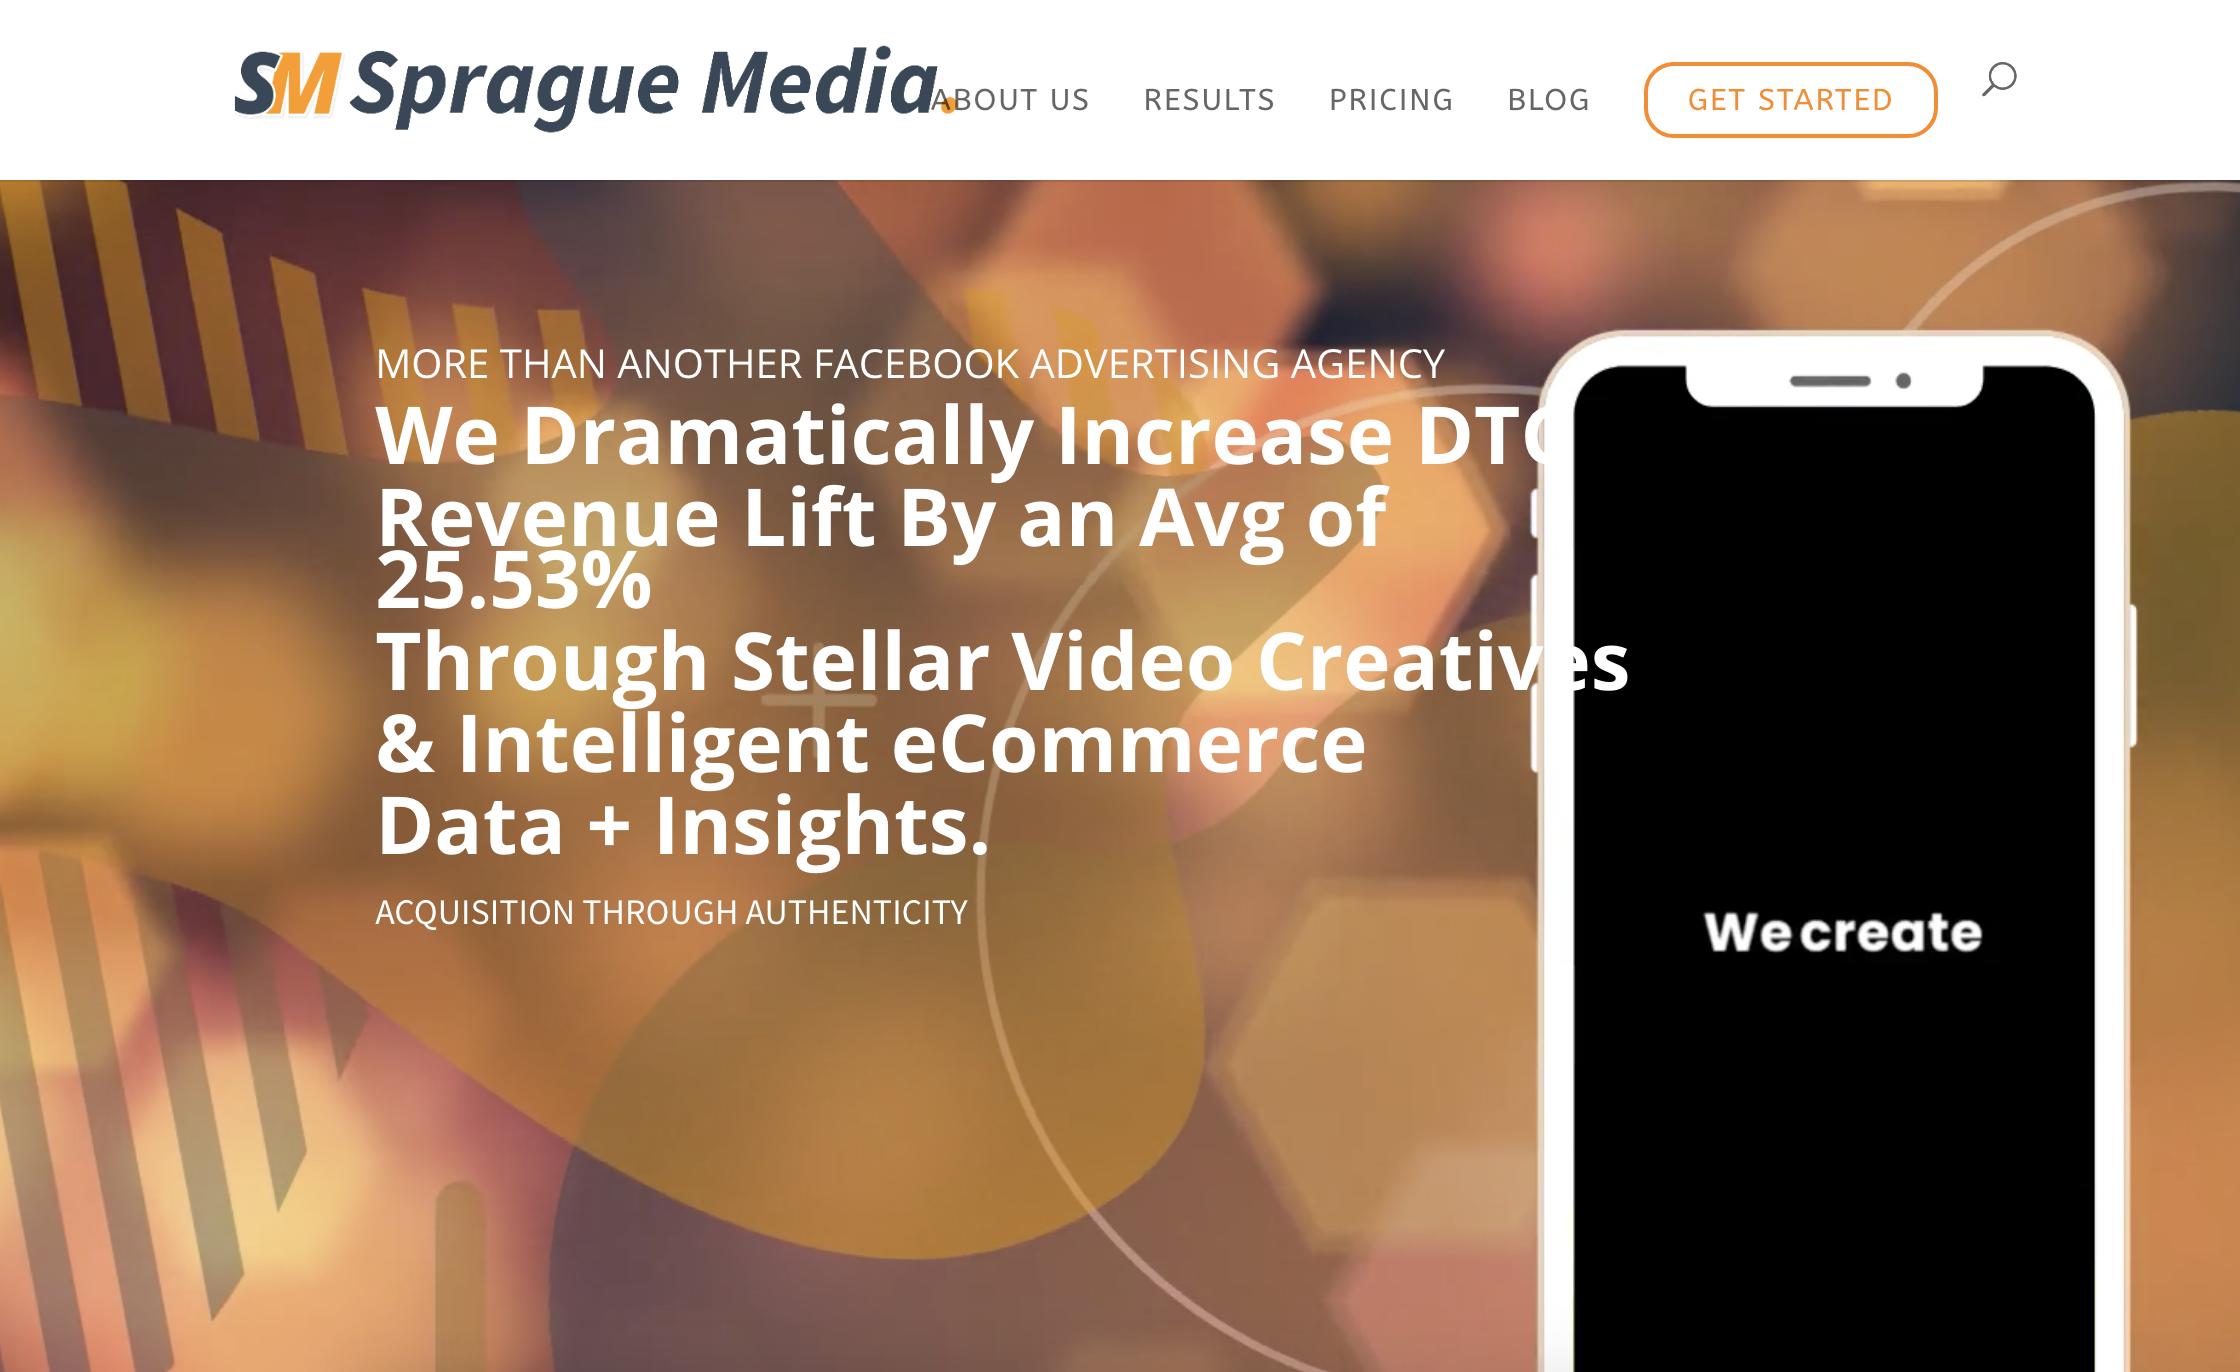 Sprague Media